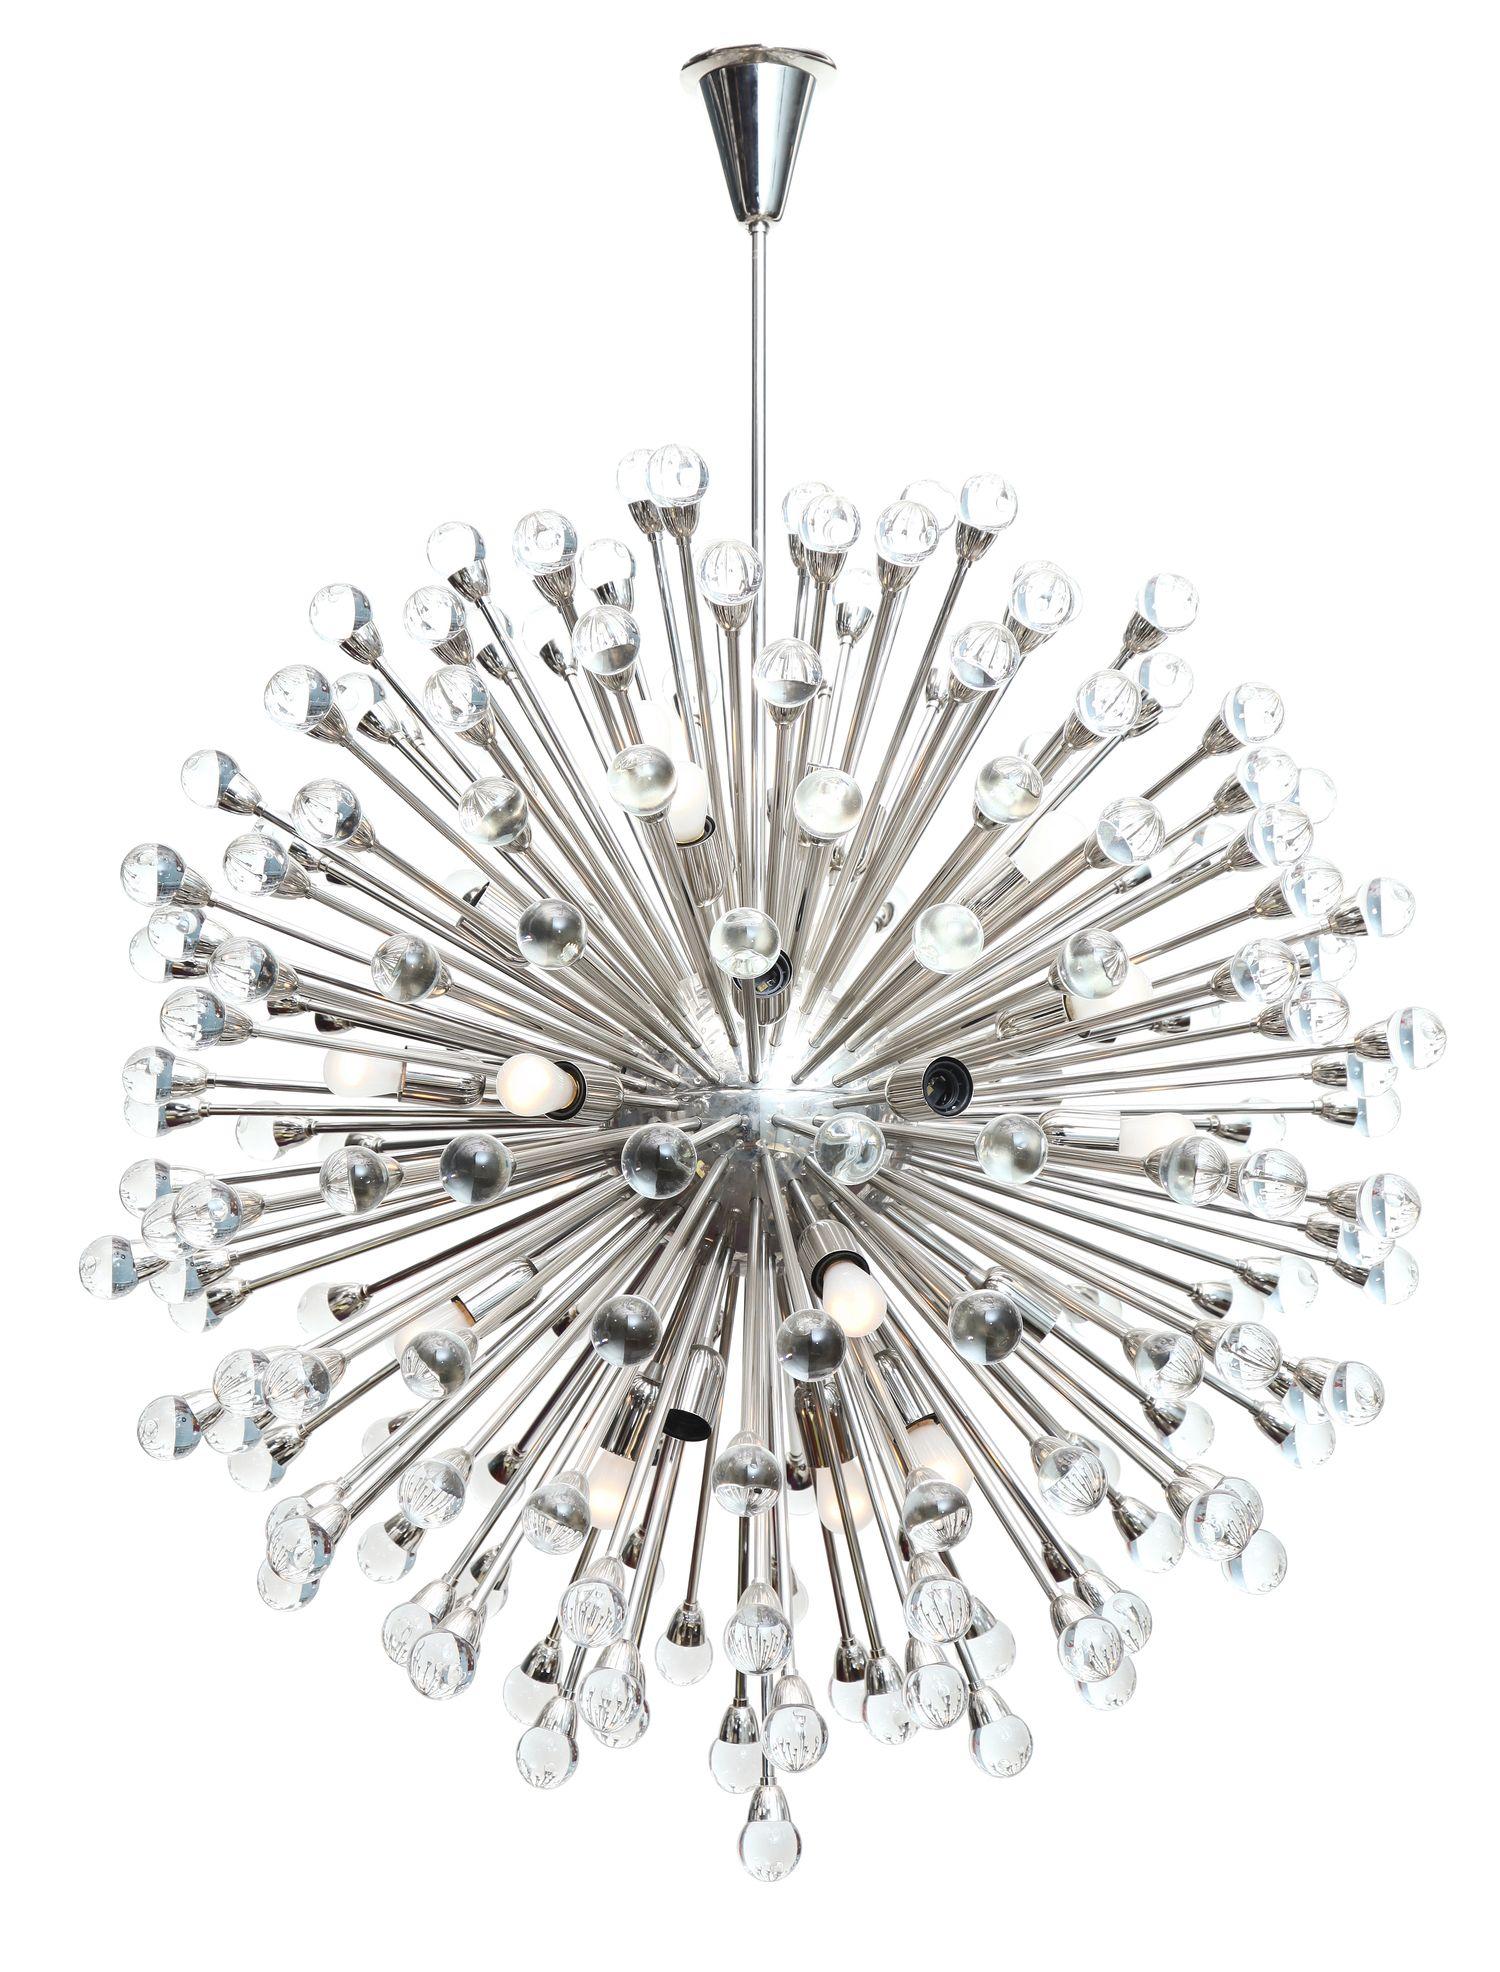 Folgate Grande Chandelier Chandelier Lighting Wrought Iron